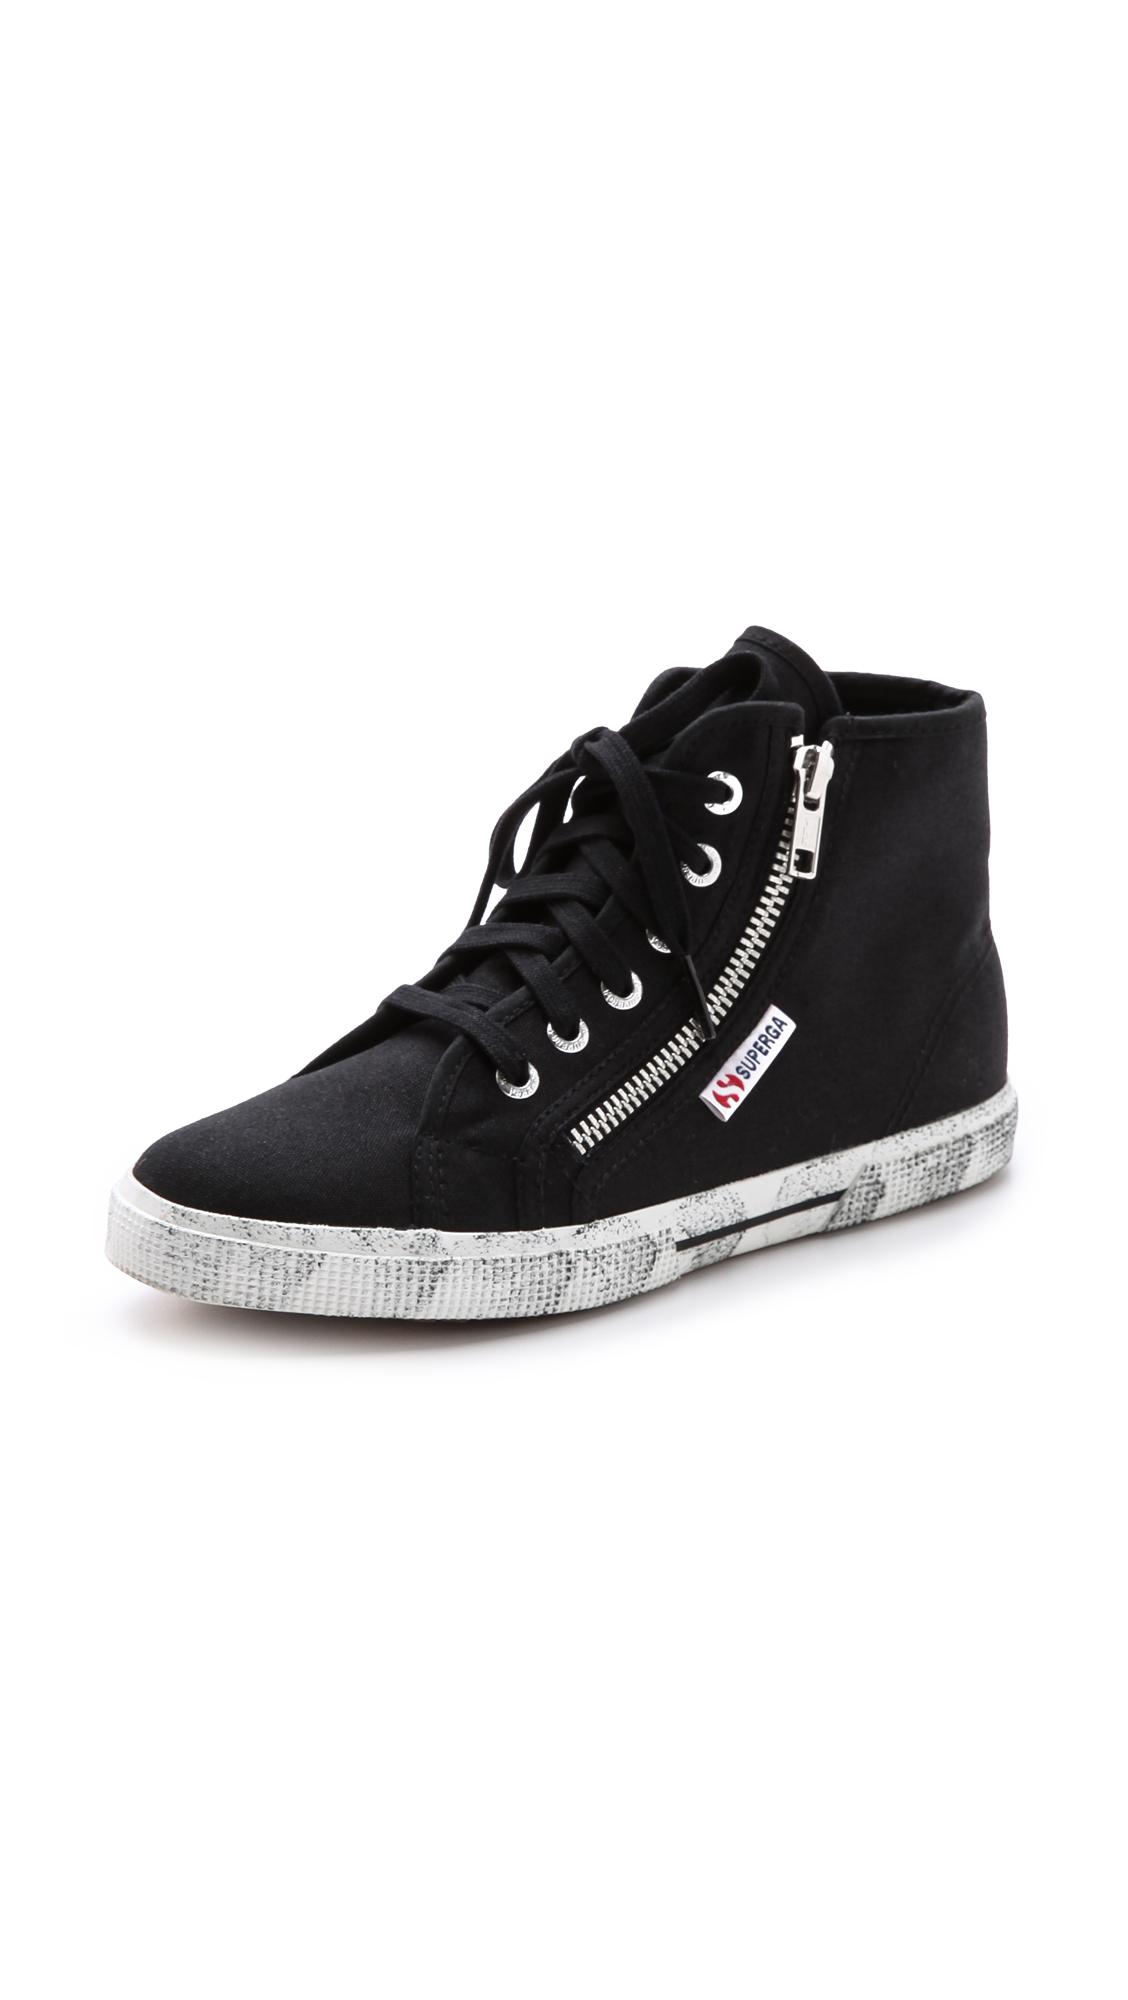 fc335407b780 Superga High Top Sneakers